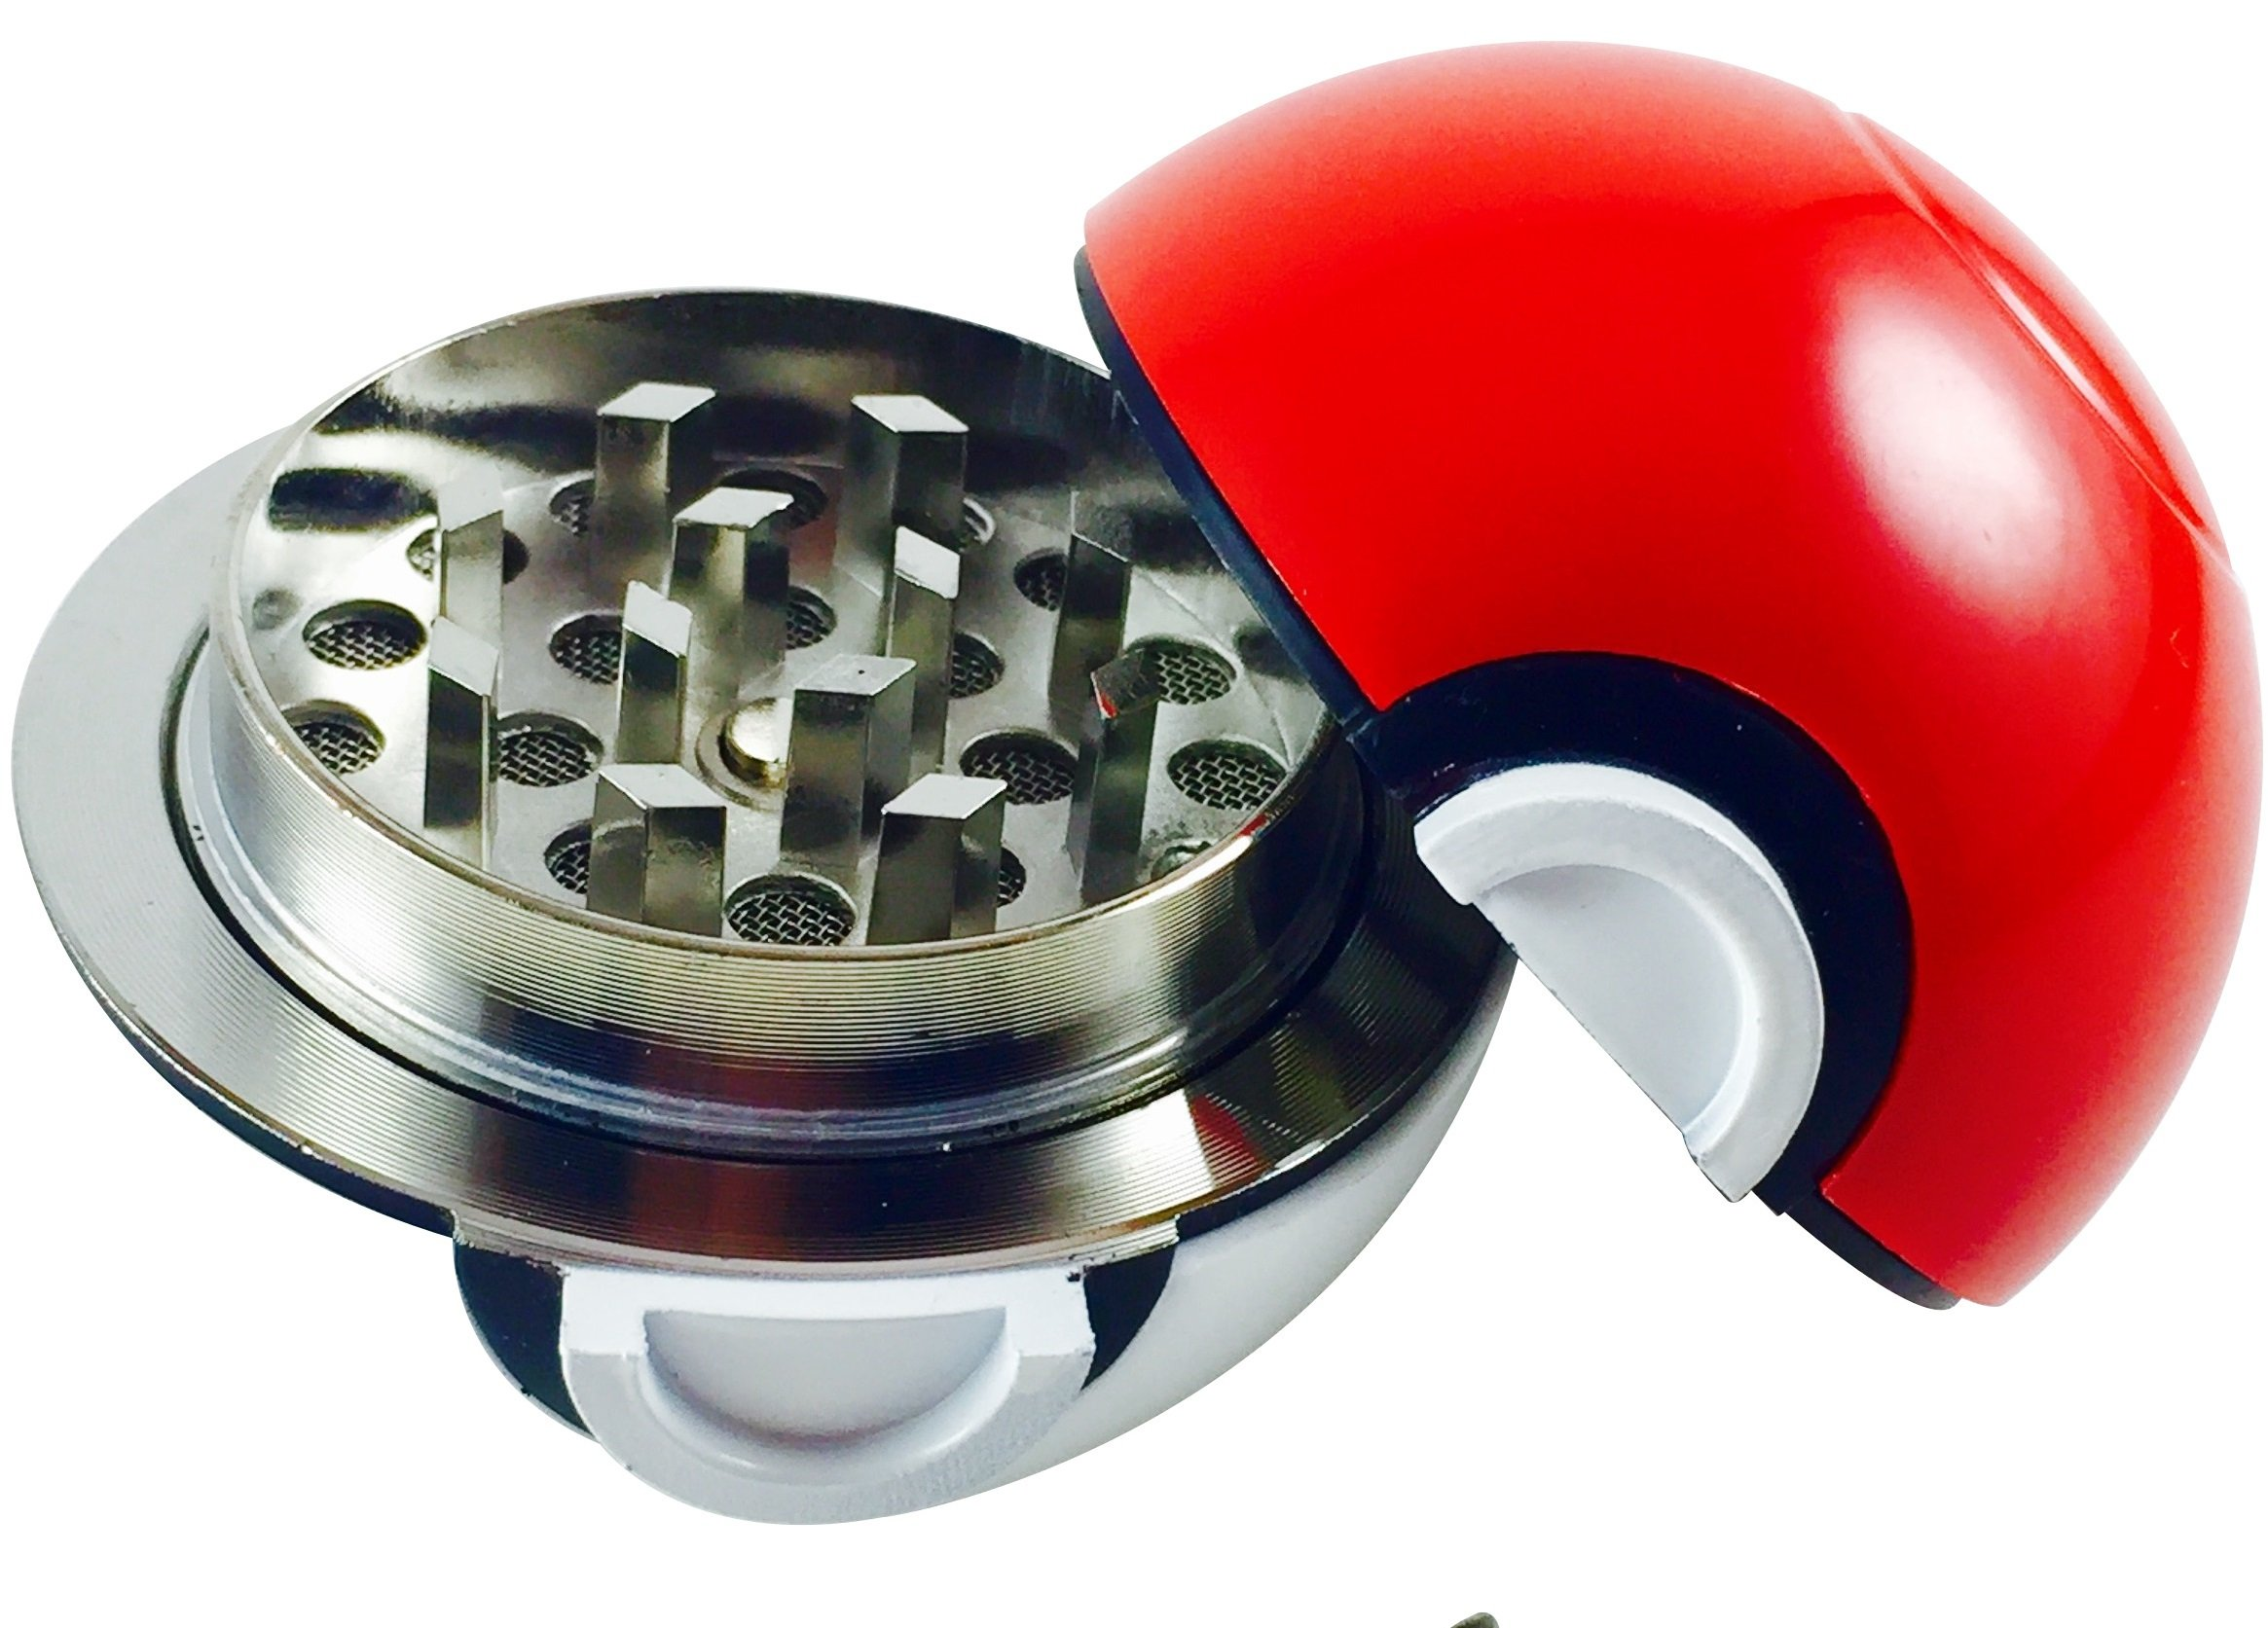 Pokeball Grinder, Pokemon Herb Spice & Tobacco Grinder Tool With Pollen Catcher & Bonus Kief Scraper, 3 Part Grinder, 2.2 Inches, By Official